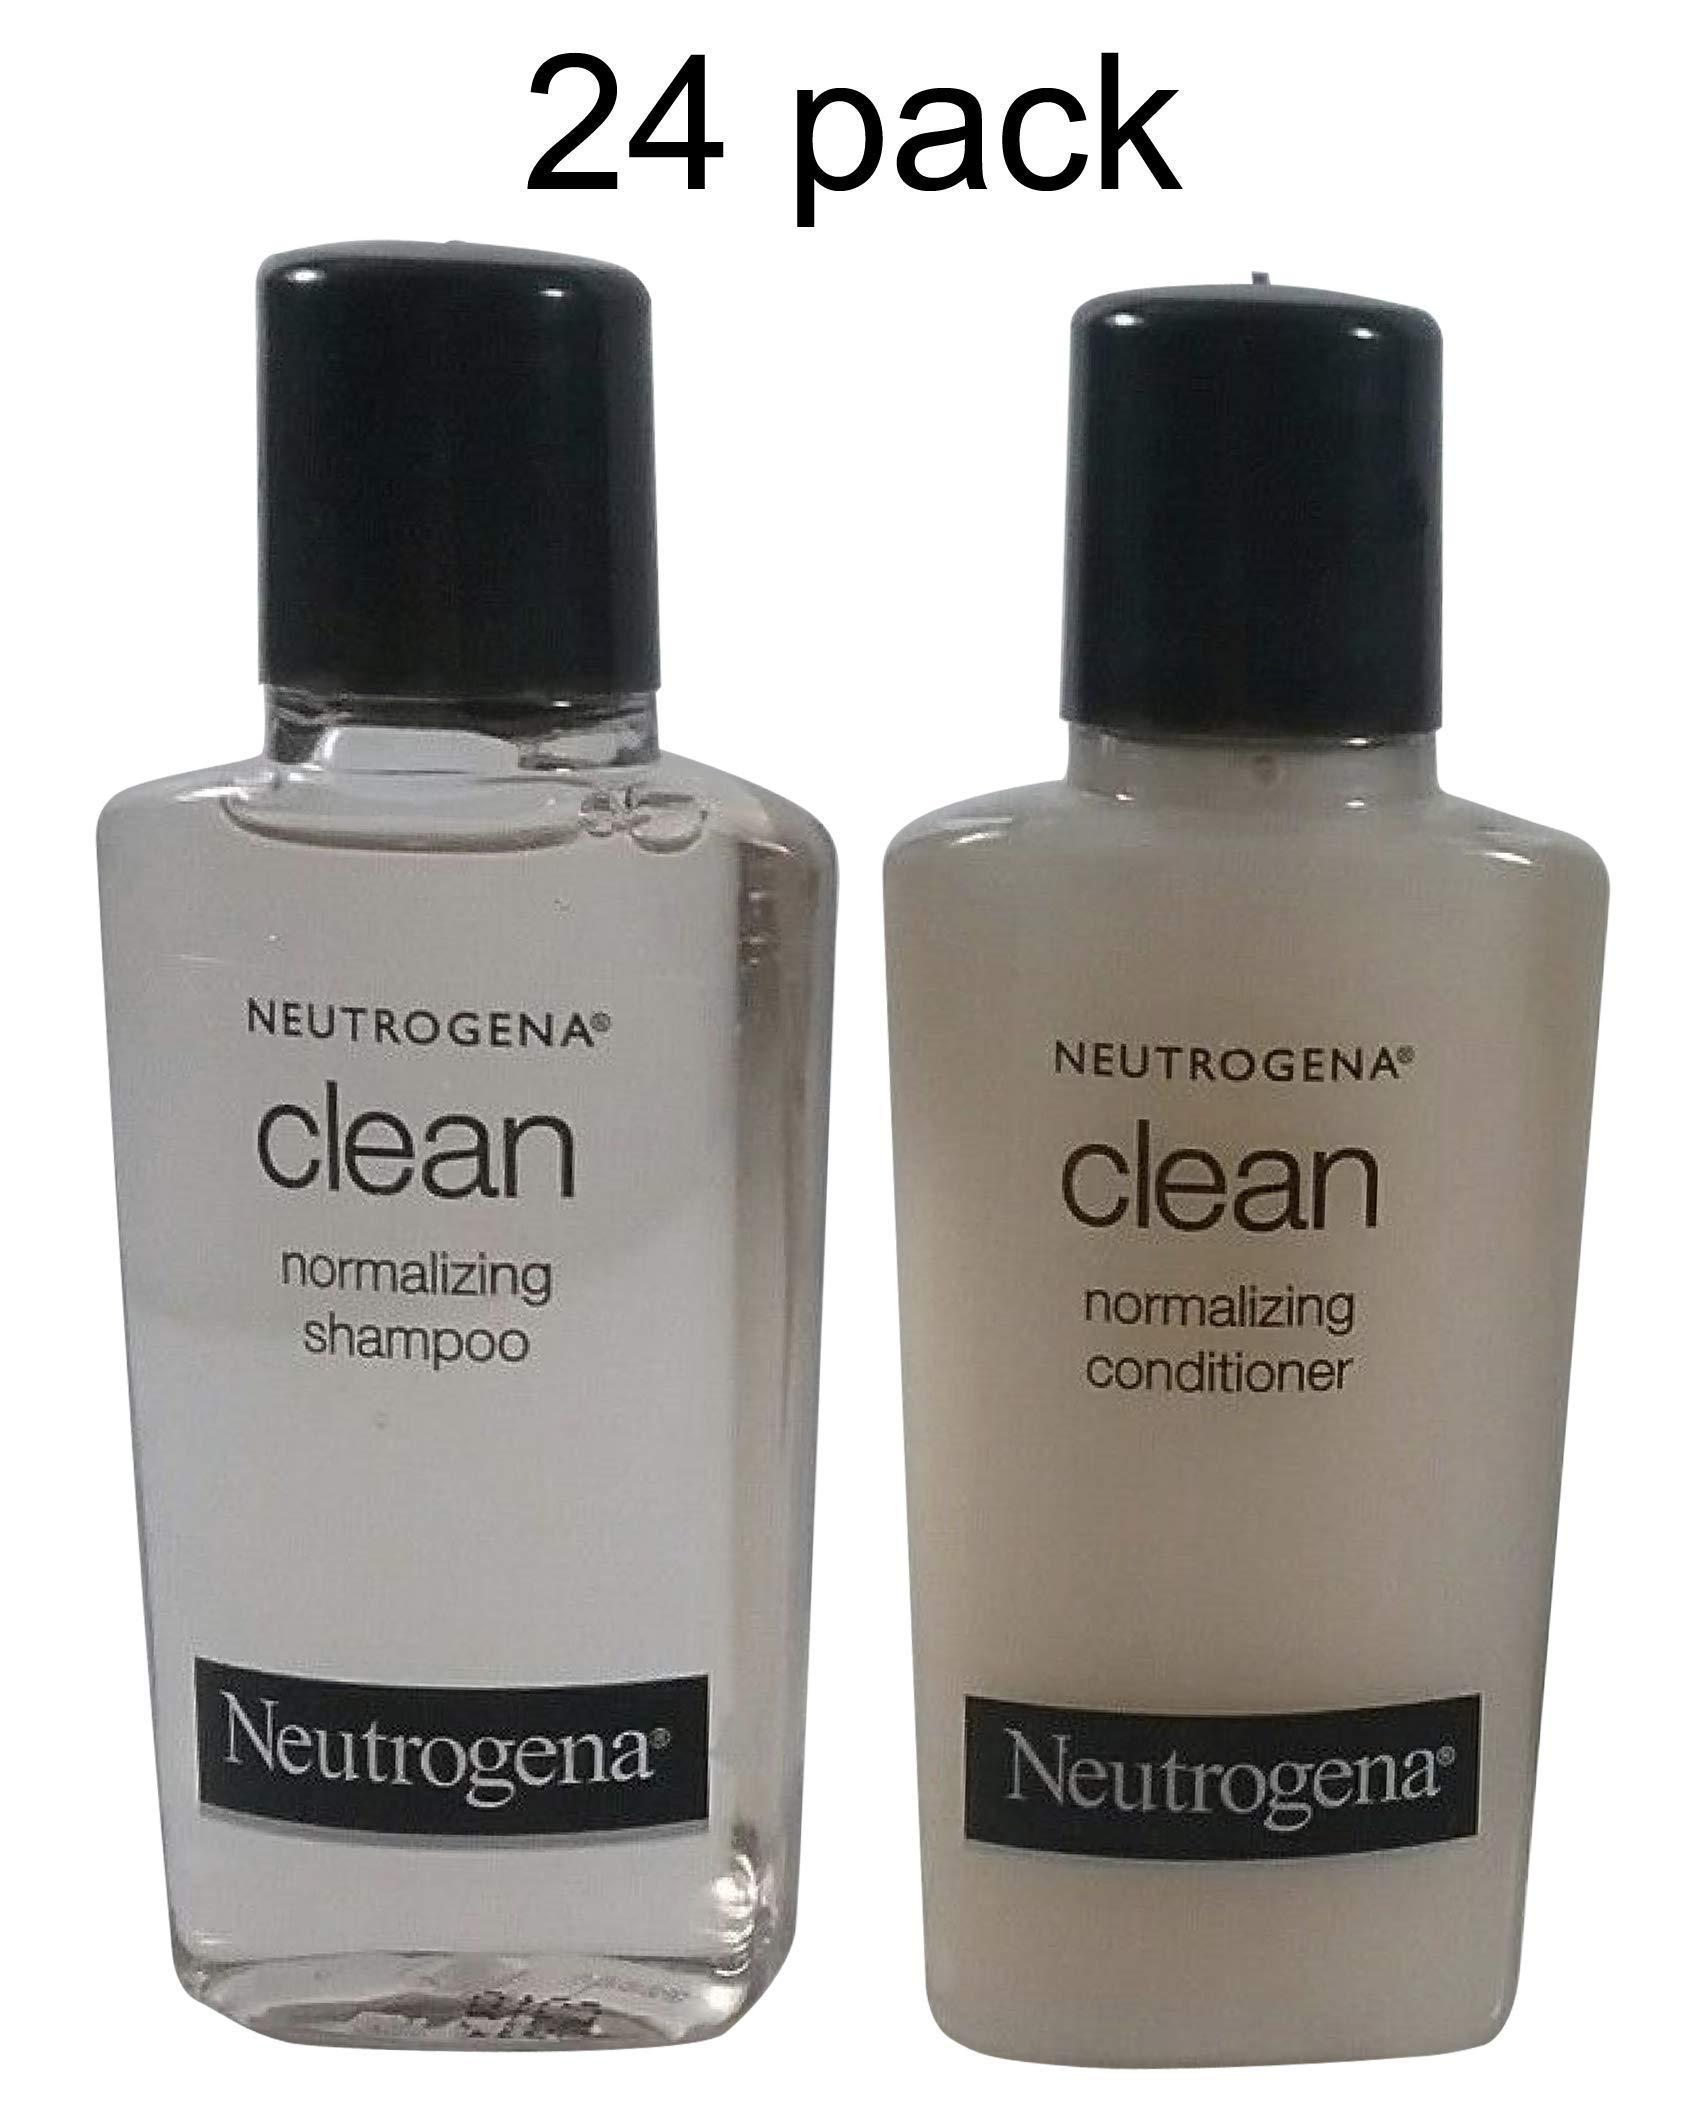 Neutrogena Clean Normalizing Shampoo & Conditioner 0.9 oz bottles - Lot of 24 - (12 each) - Total of 21.6 oz by Neutrogena